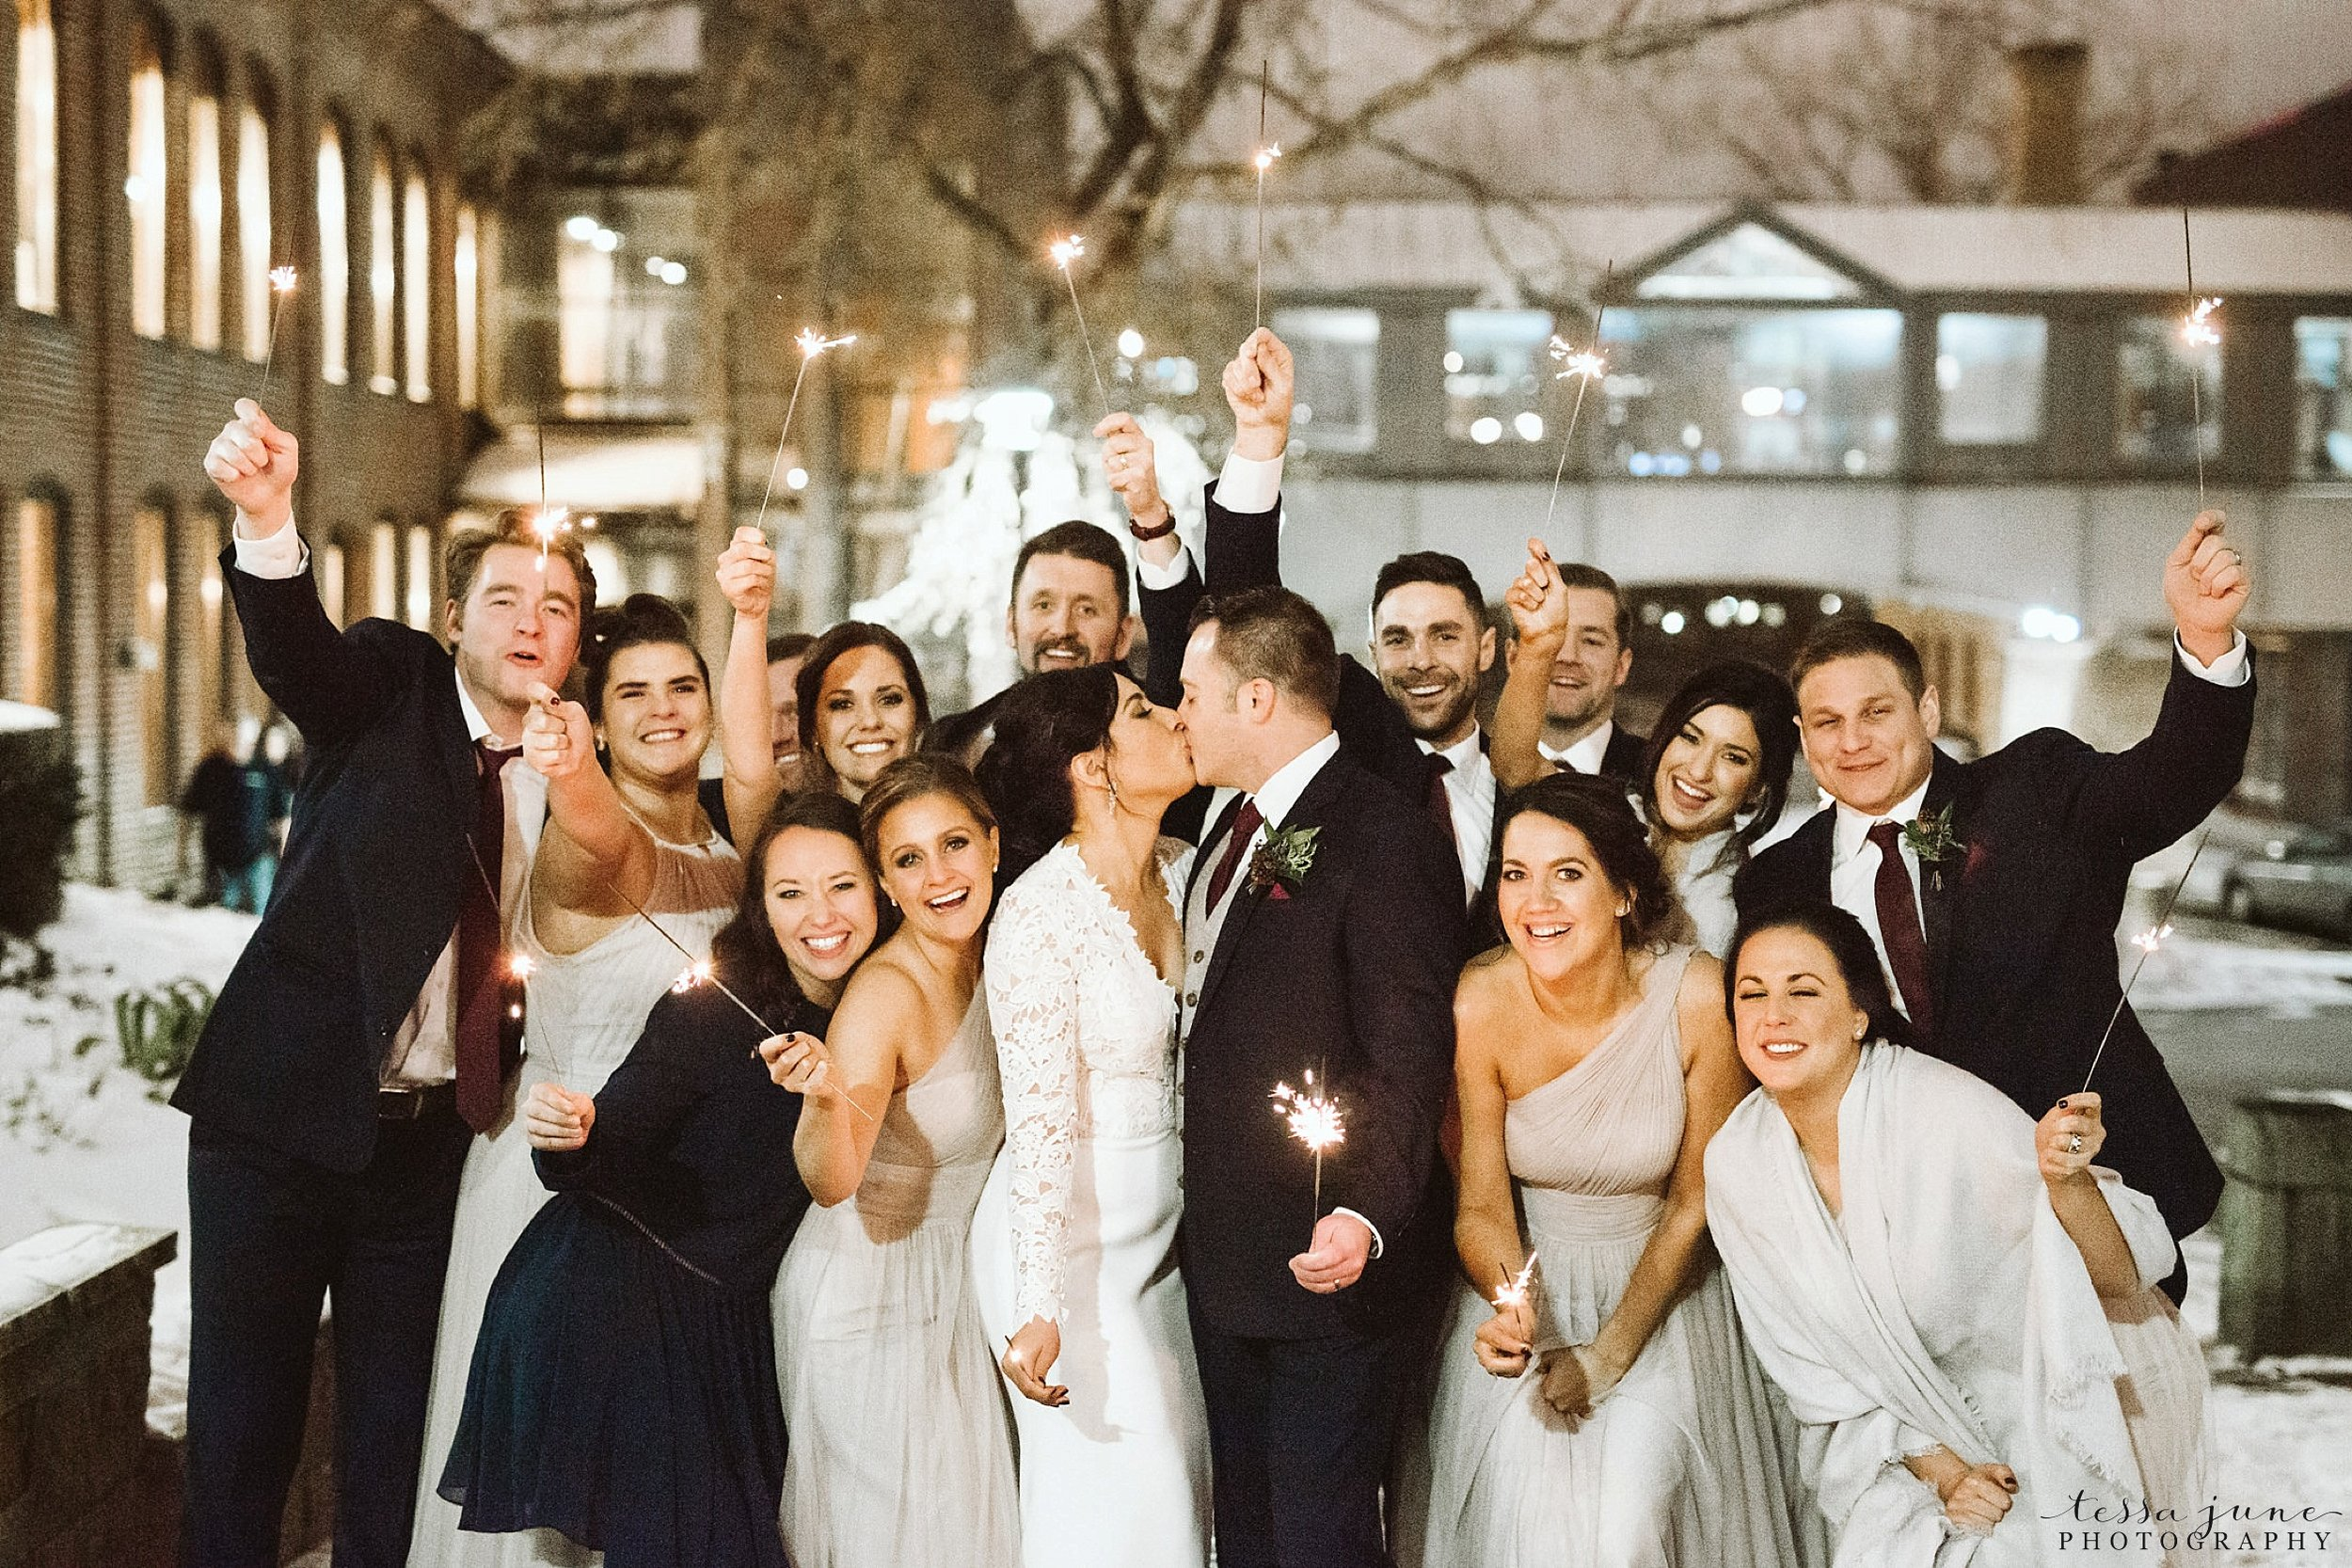 minneapolis-event-center-winter-romantic-snow-wedding-december-221.jpg